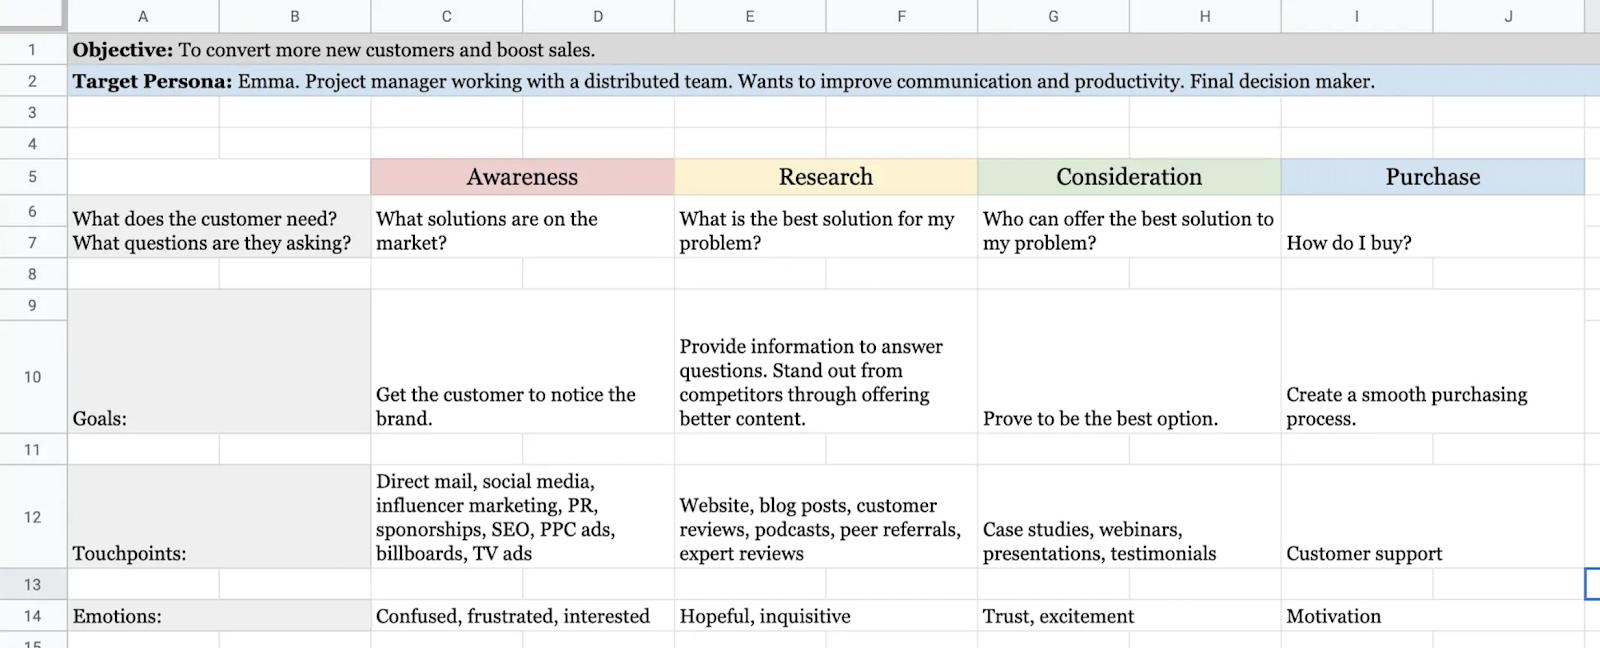 B2B Customer Journey Map using Excel